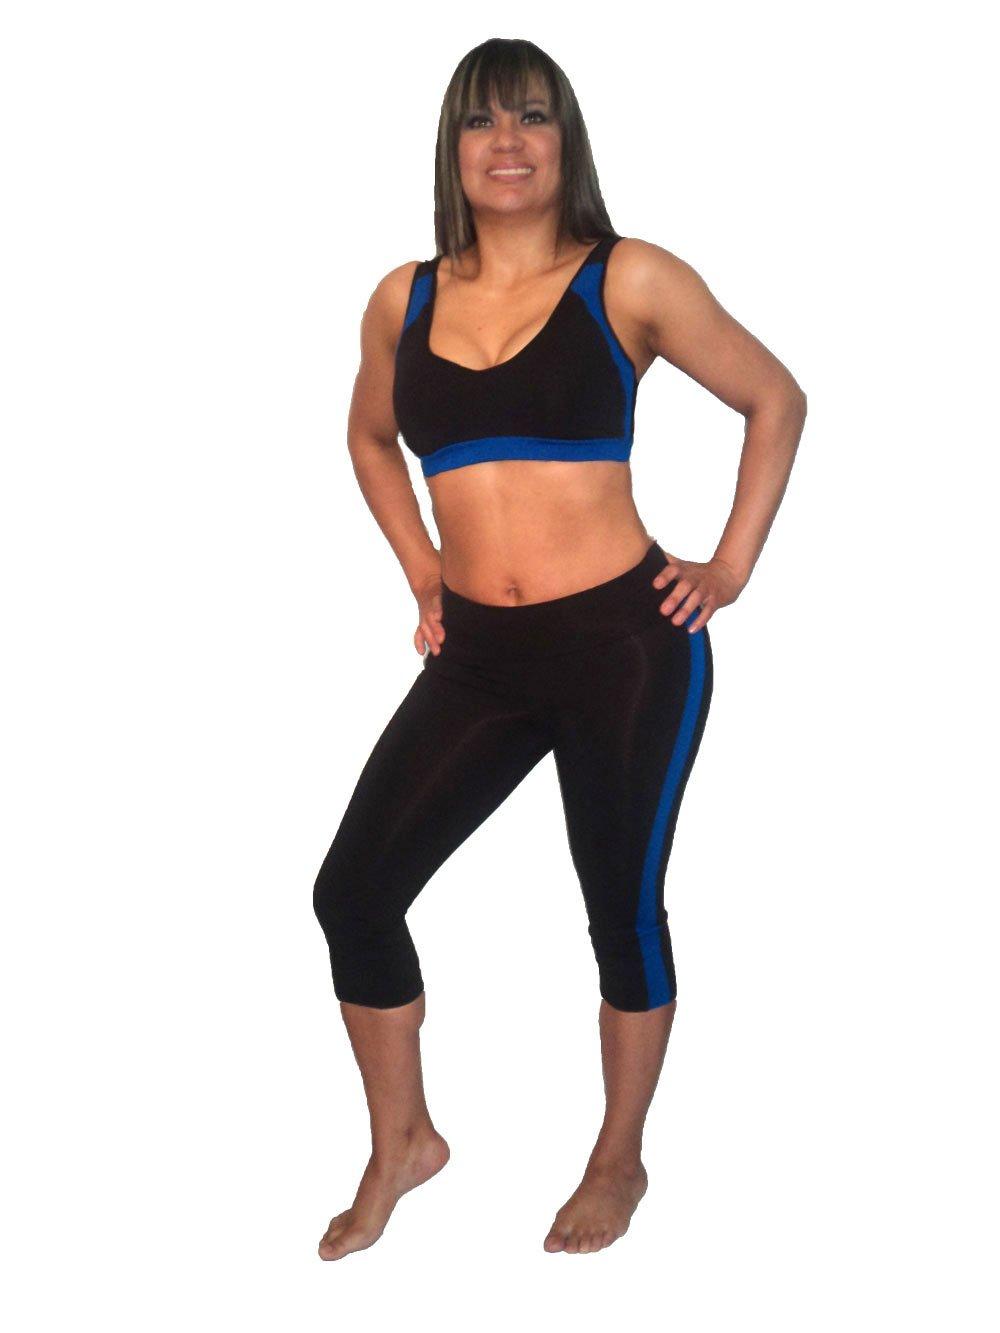 314 Ladies shock absorber sports bra & fitness, gym, yoga, Pilates exercise wear. 2 PIECE SET. Women shock absorber sports bra & fitness, gym, yoga, Pilates exercise clothing £24.99